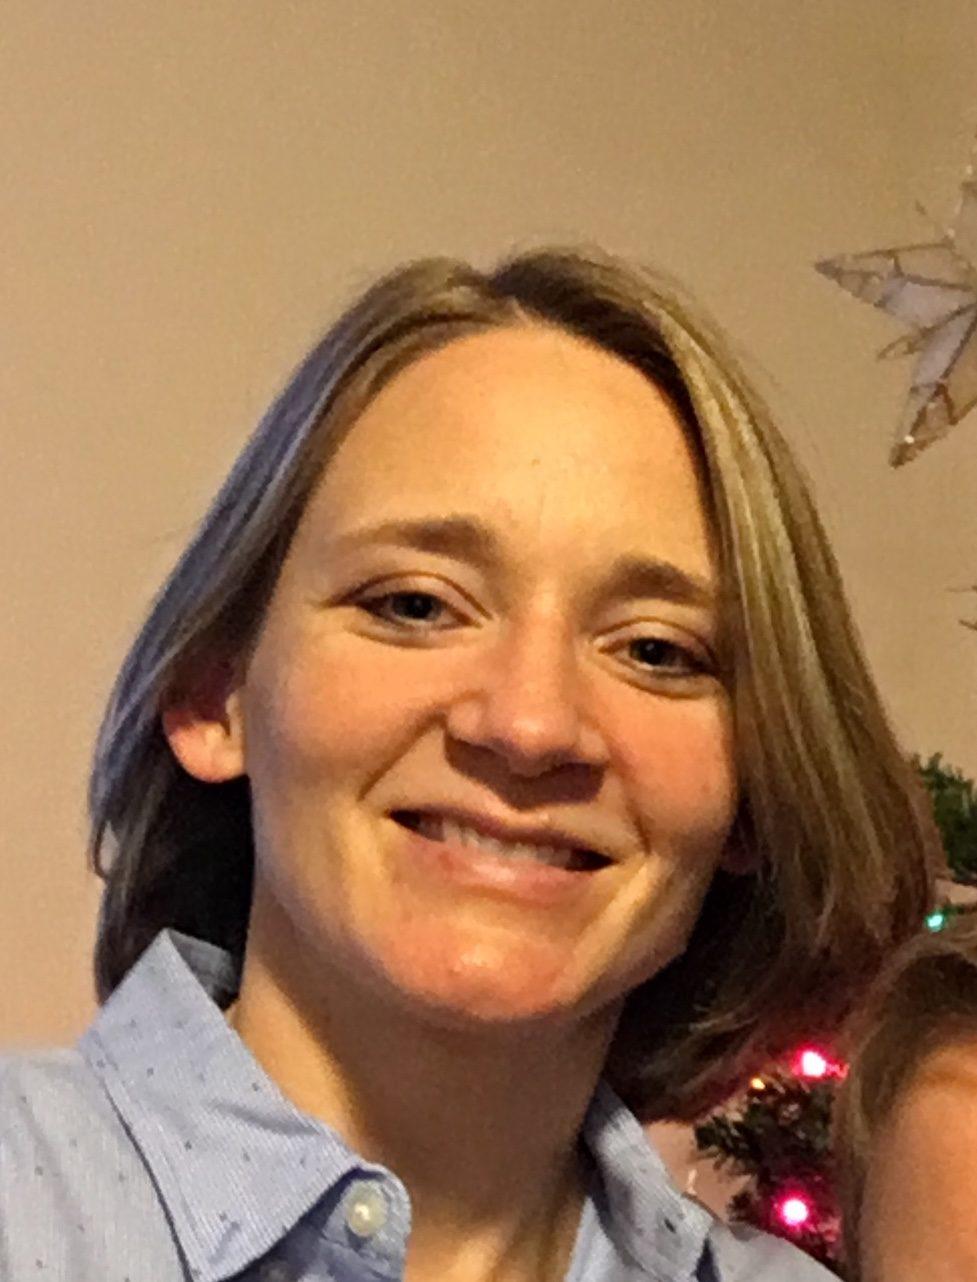 Personal Trainer Spring, Texas - Amanda Strack